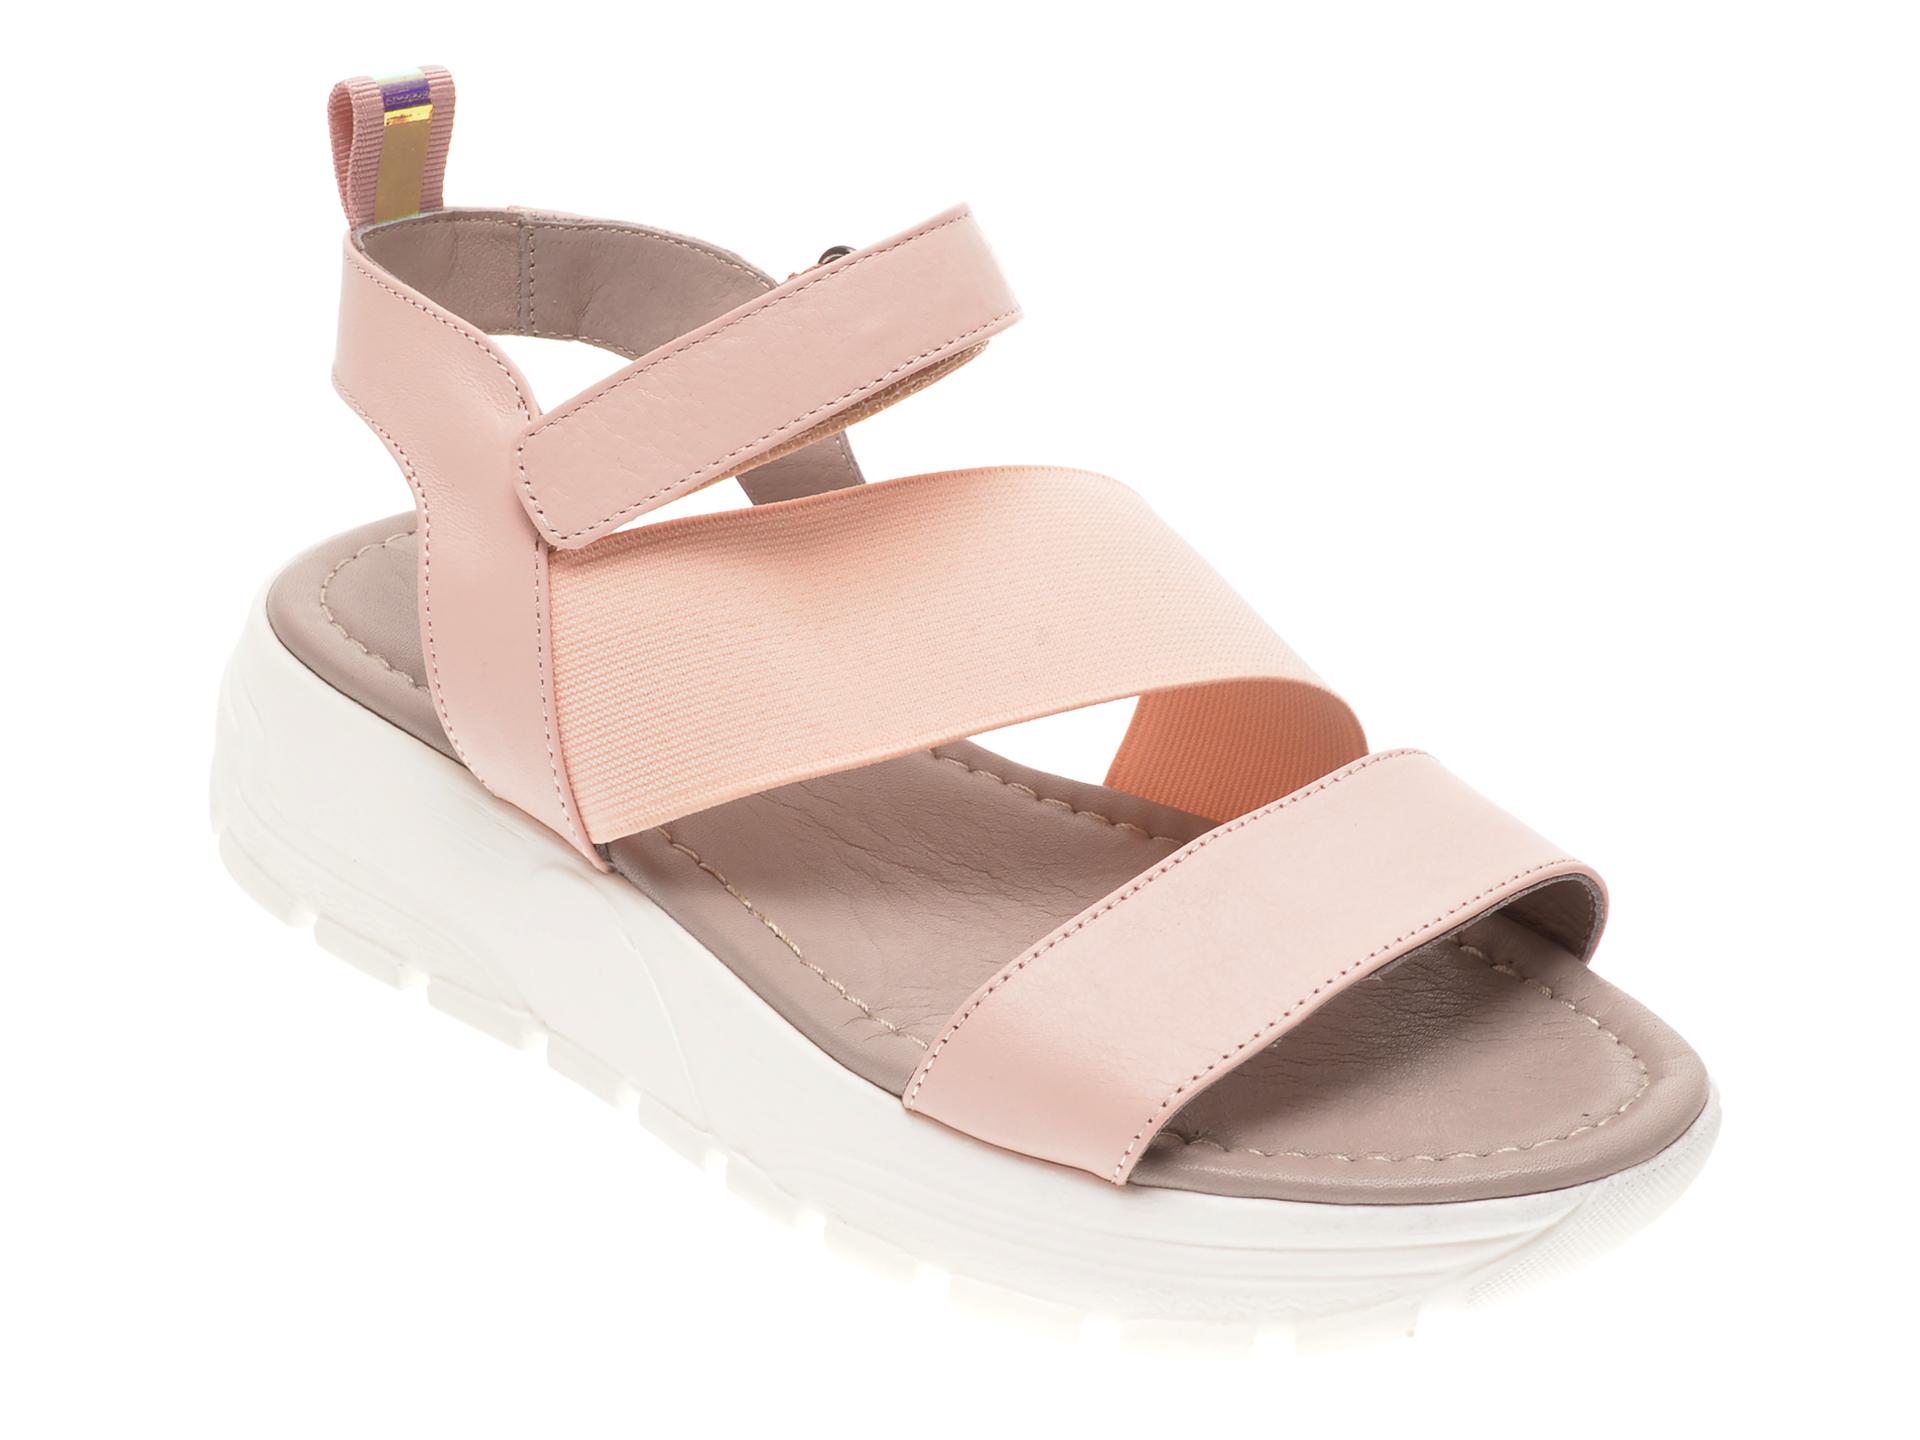 Sandale FLAVIA PASSINI roz, 0021671, din piele naturala